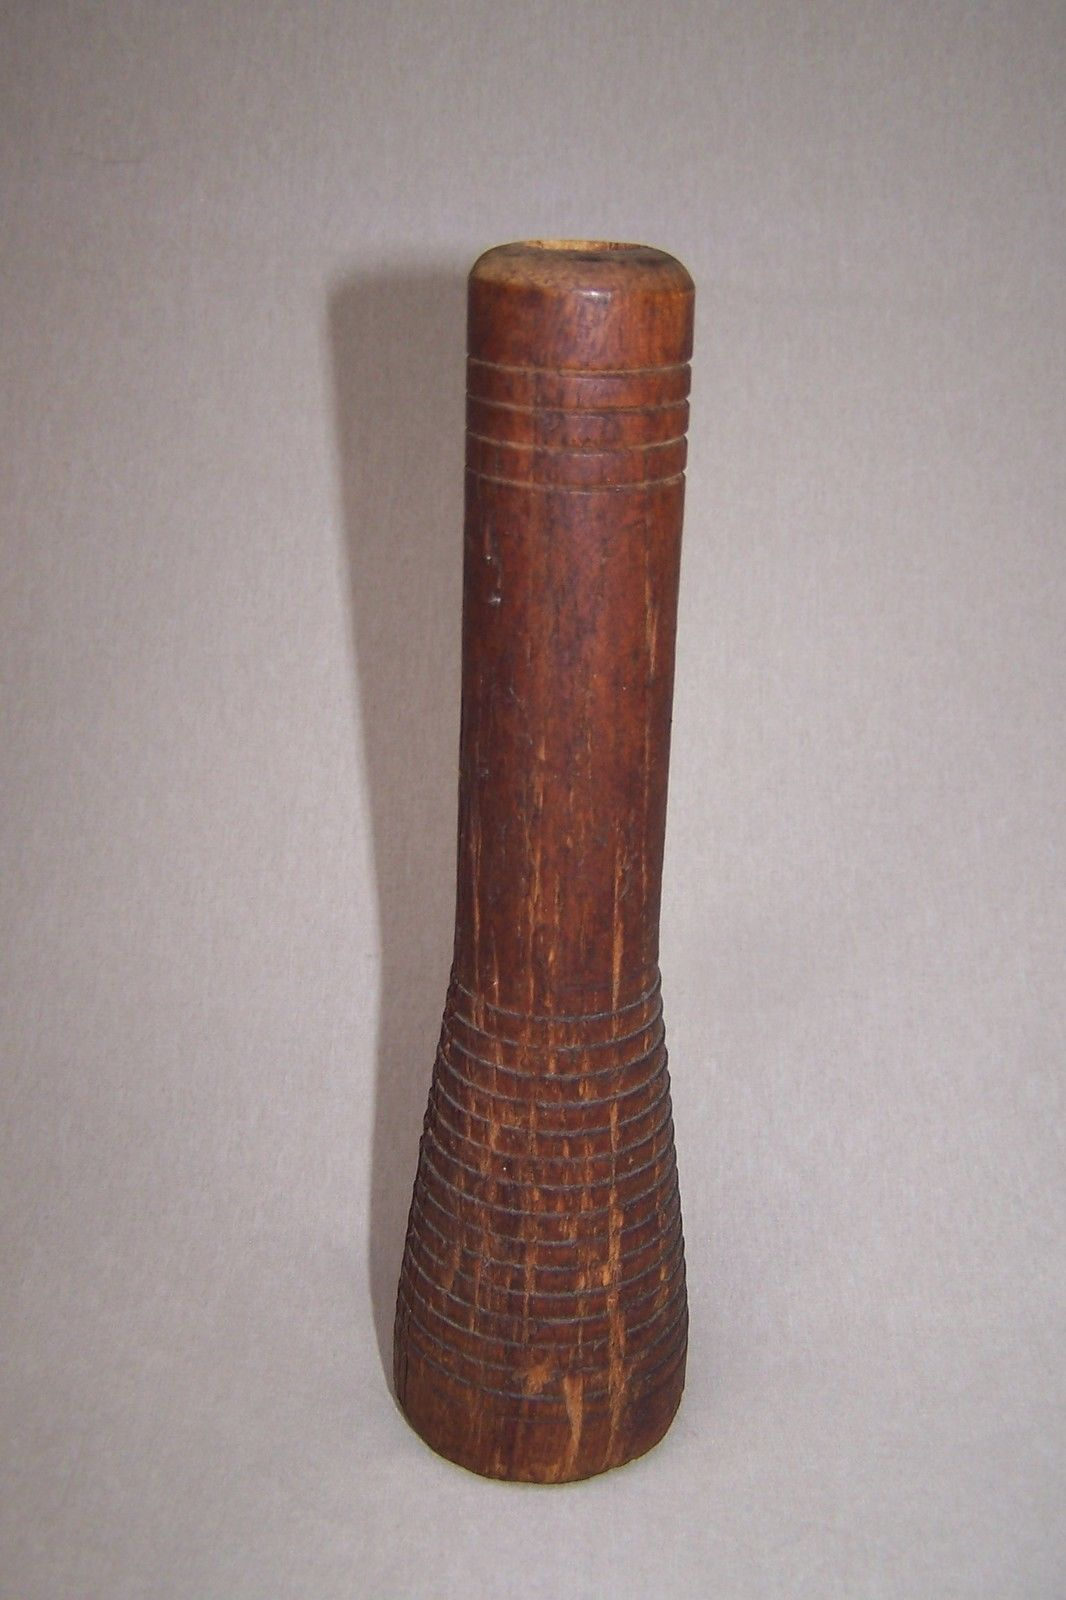 Antique Thread Spool, Pre 1930, Wood 10 in Tall - Spools ...